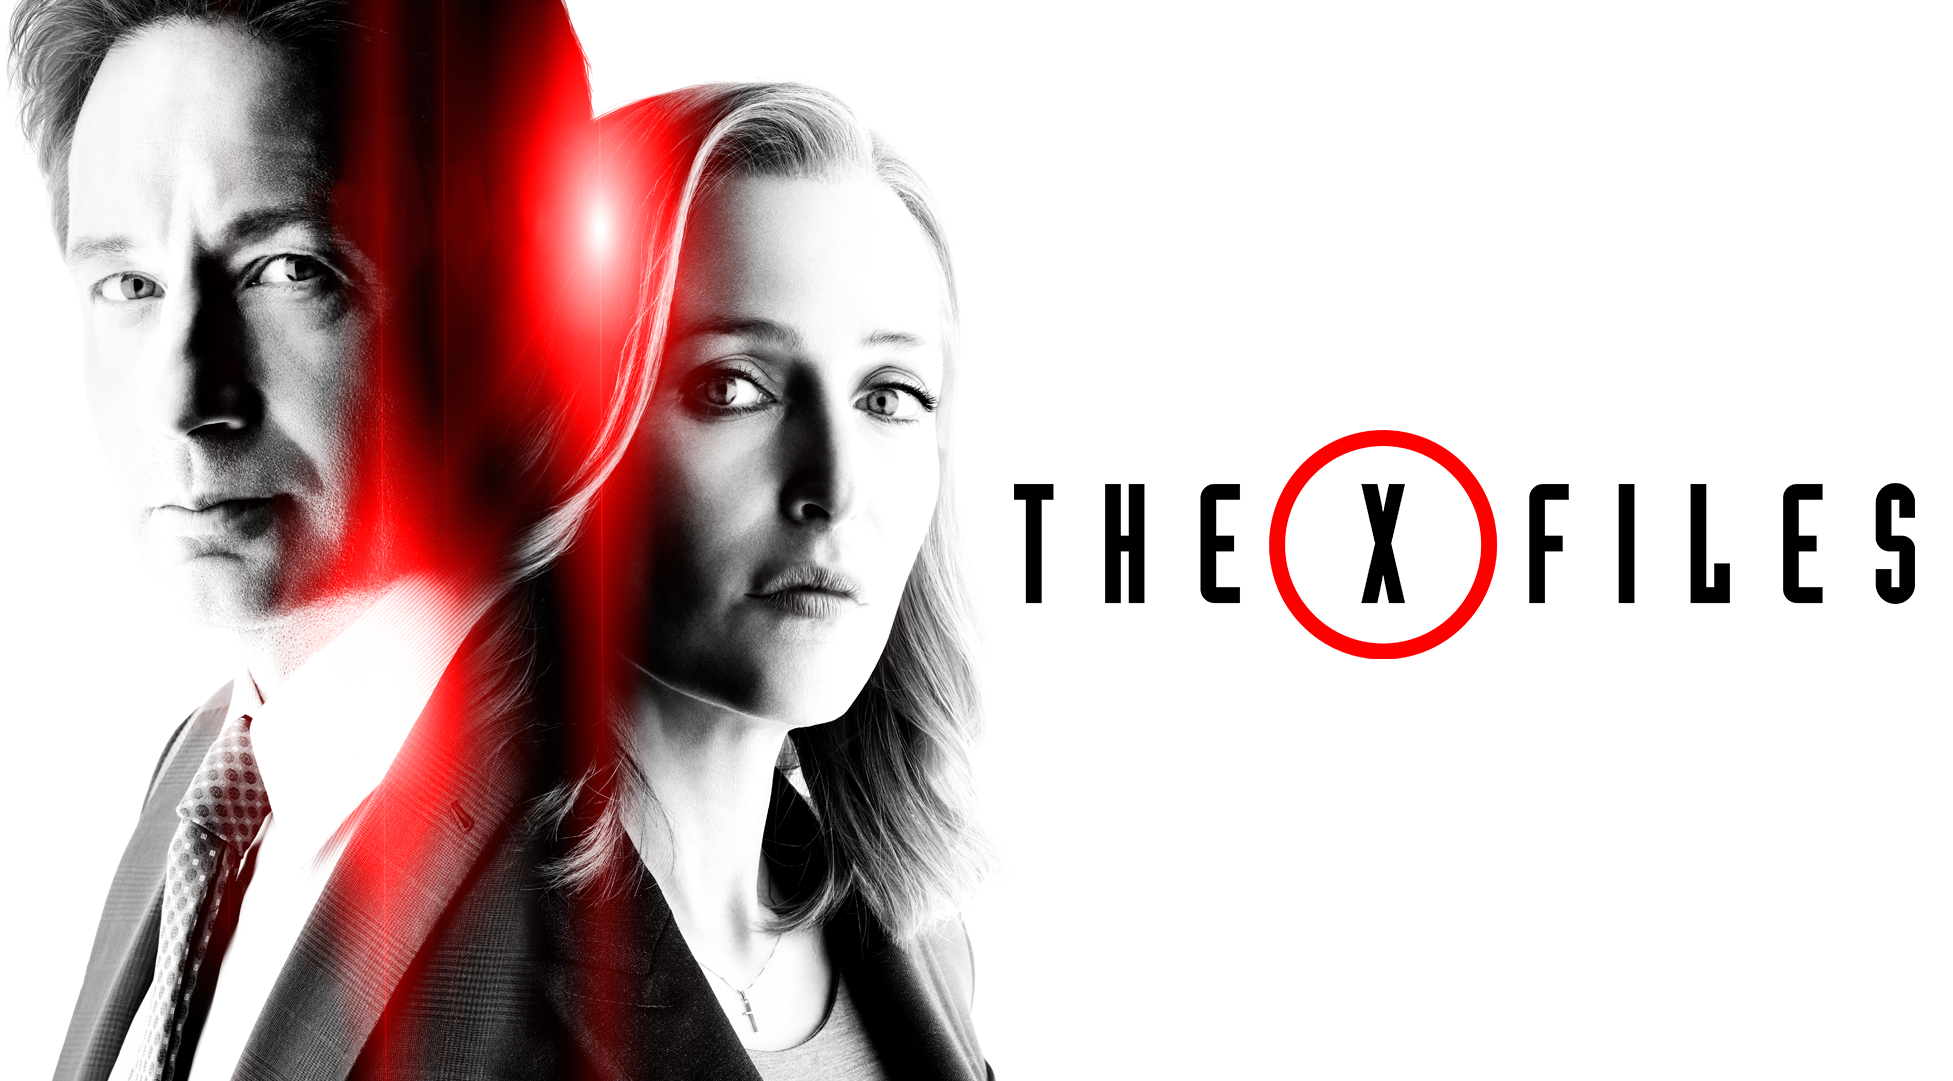 X-Files_2000x1125_thumbnail.png